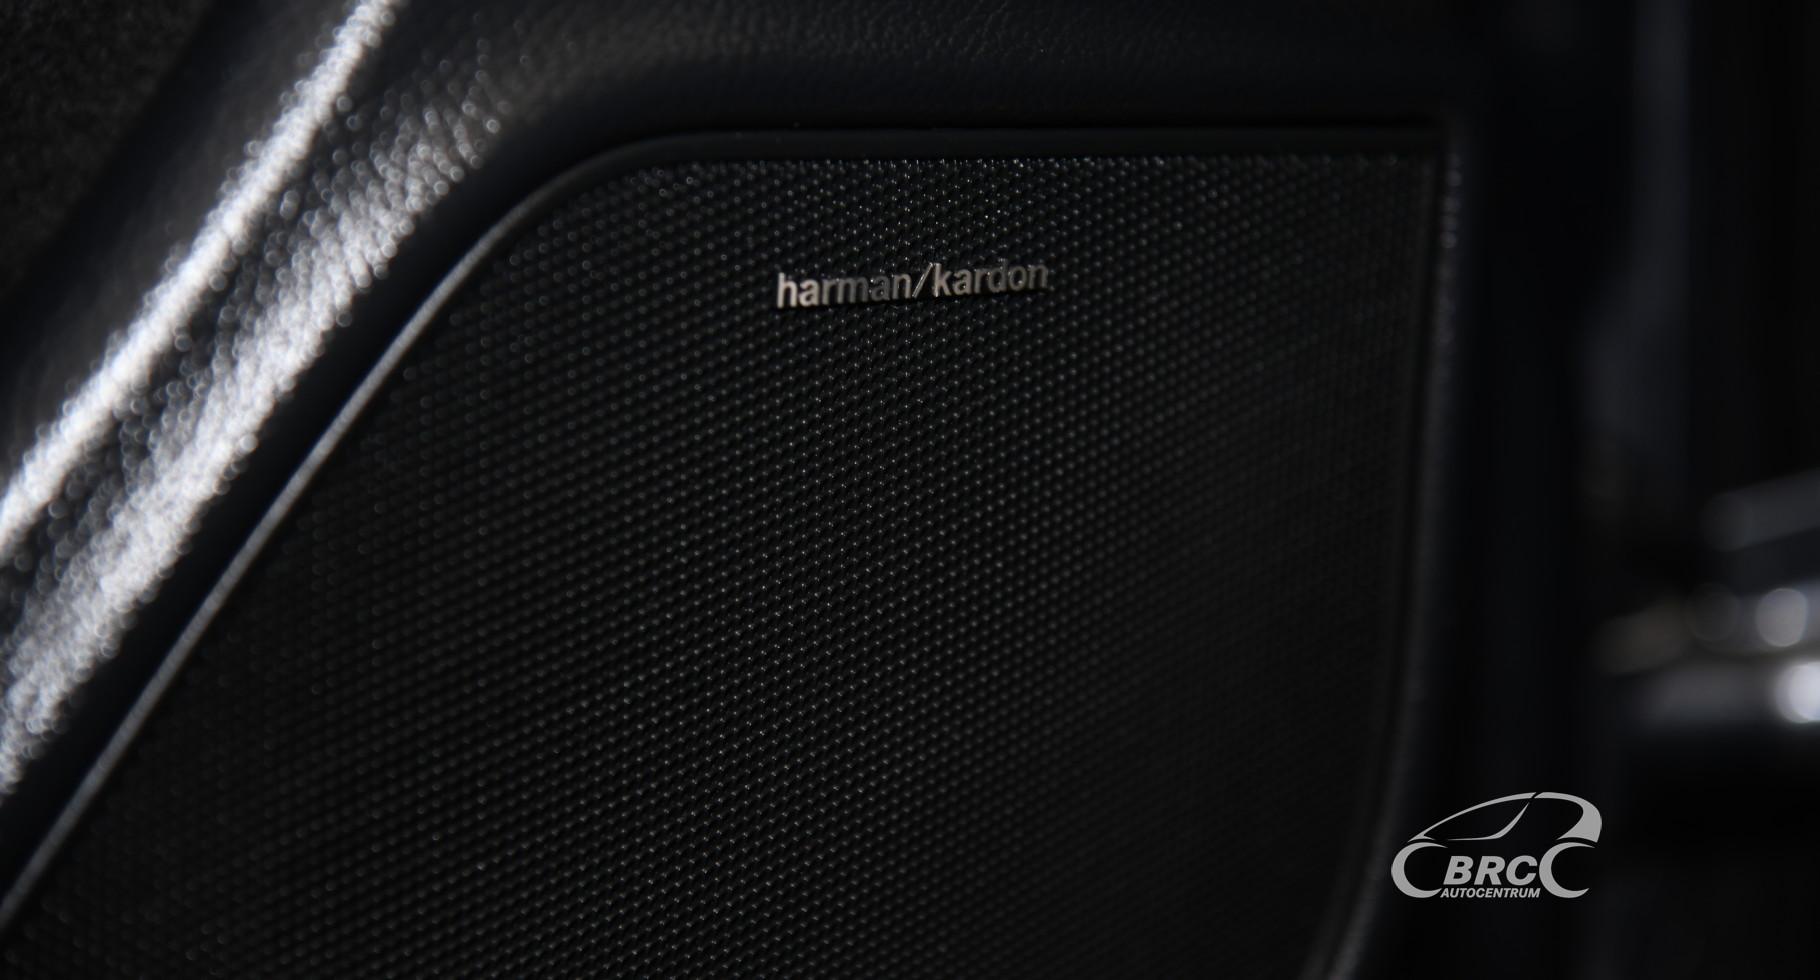 Mercedes-Benz C 250 Coupe Automatas